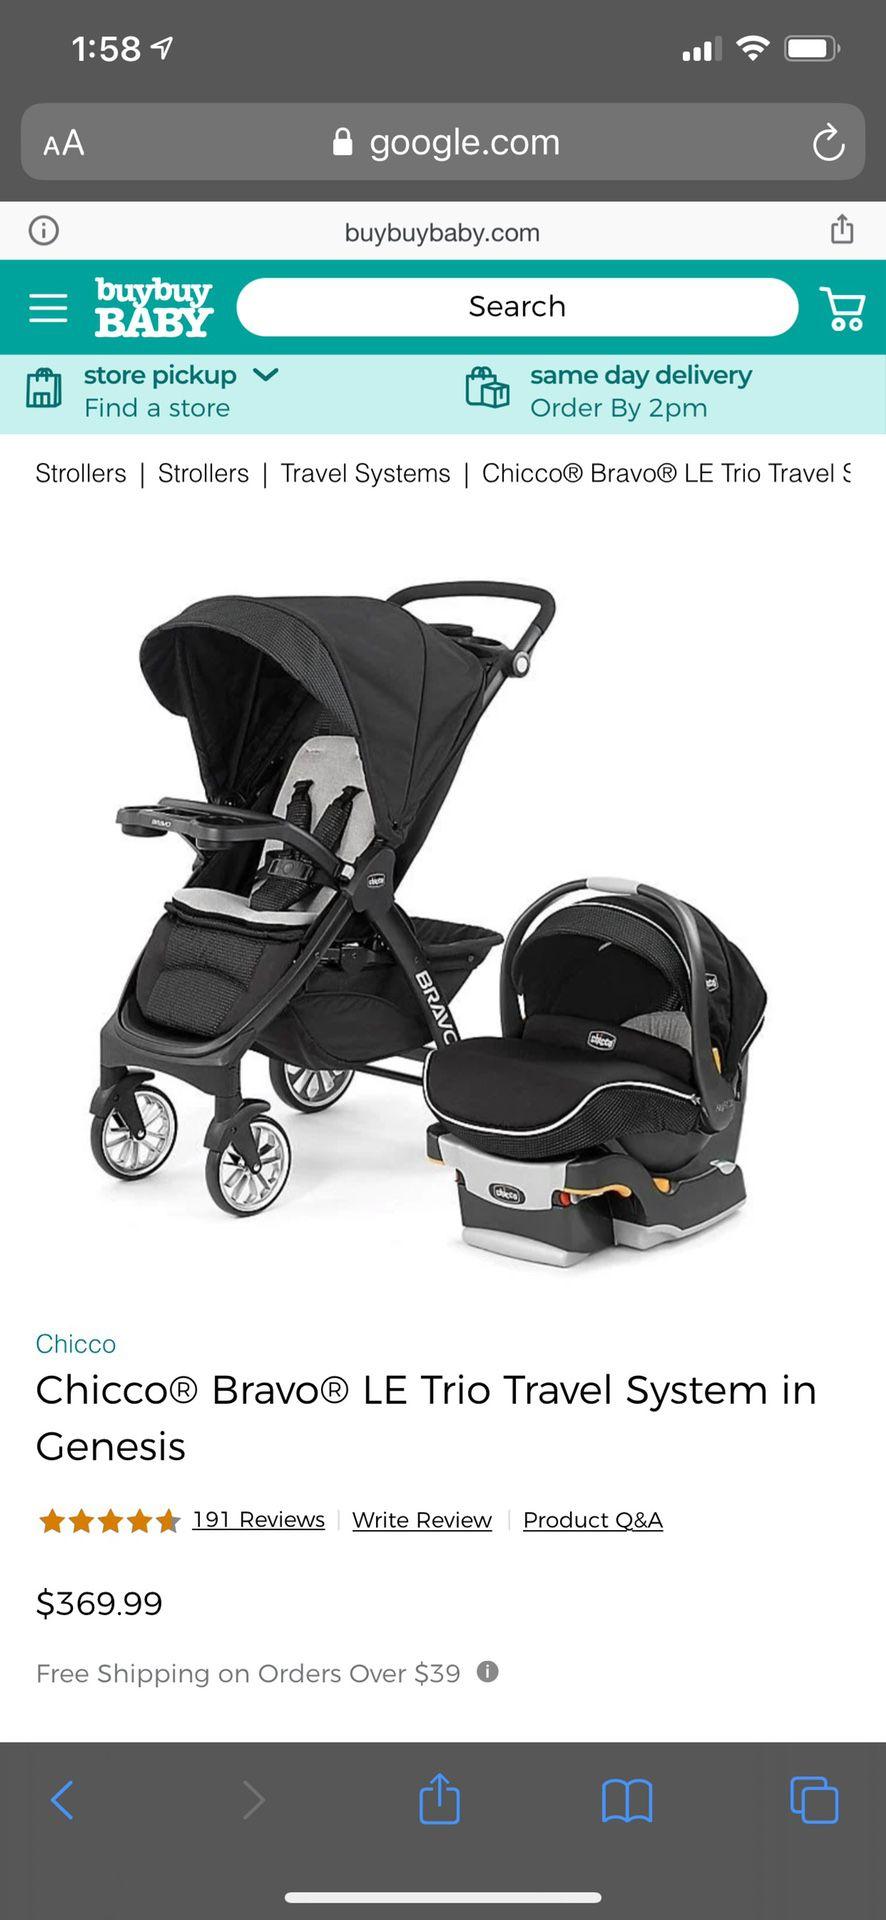 Chicco bravo LE trio travel system